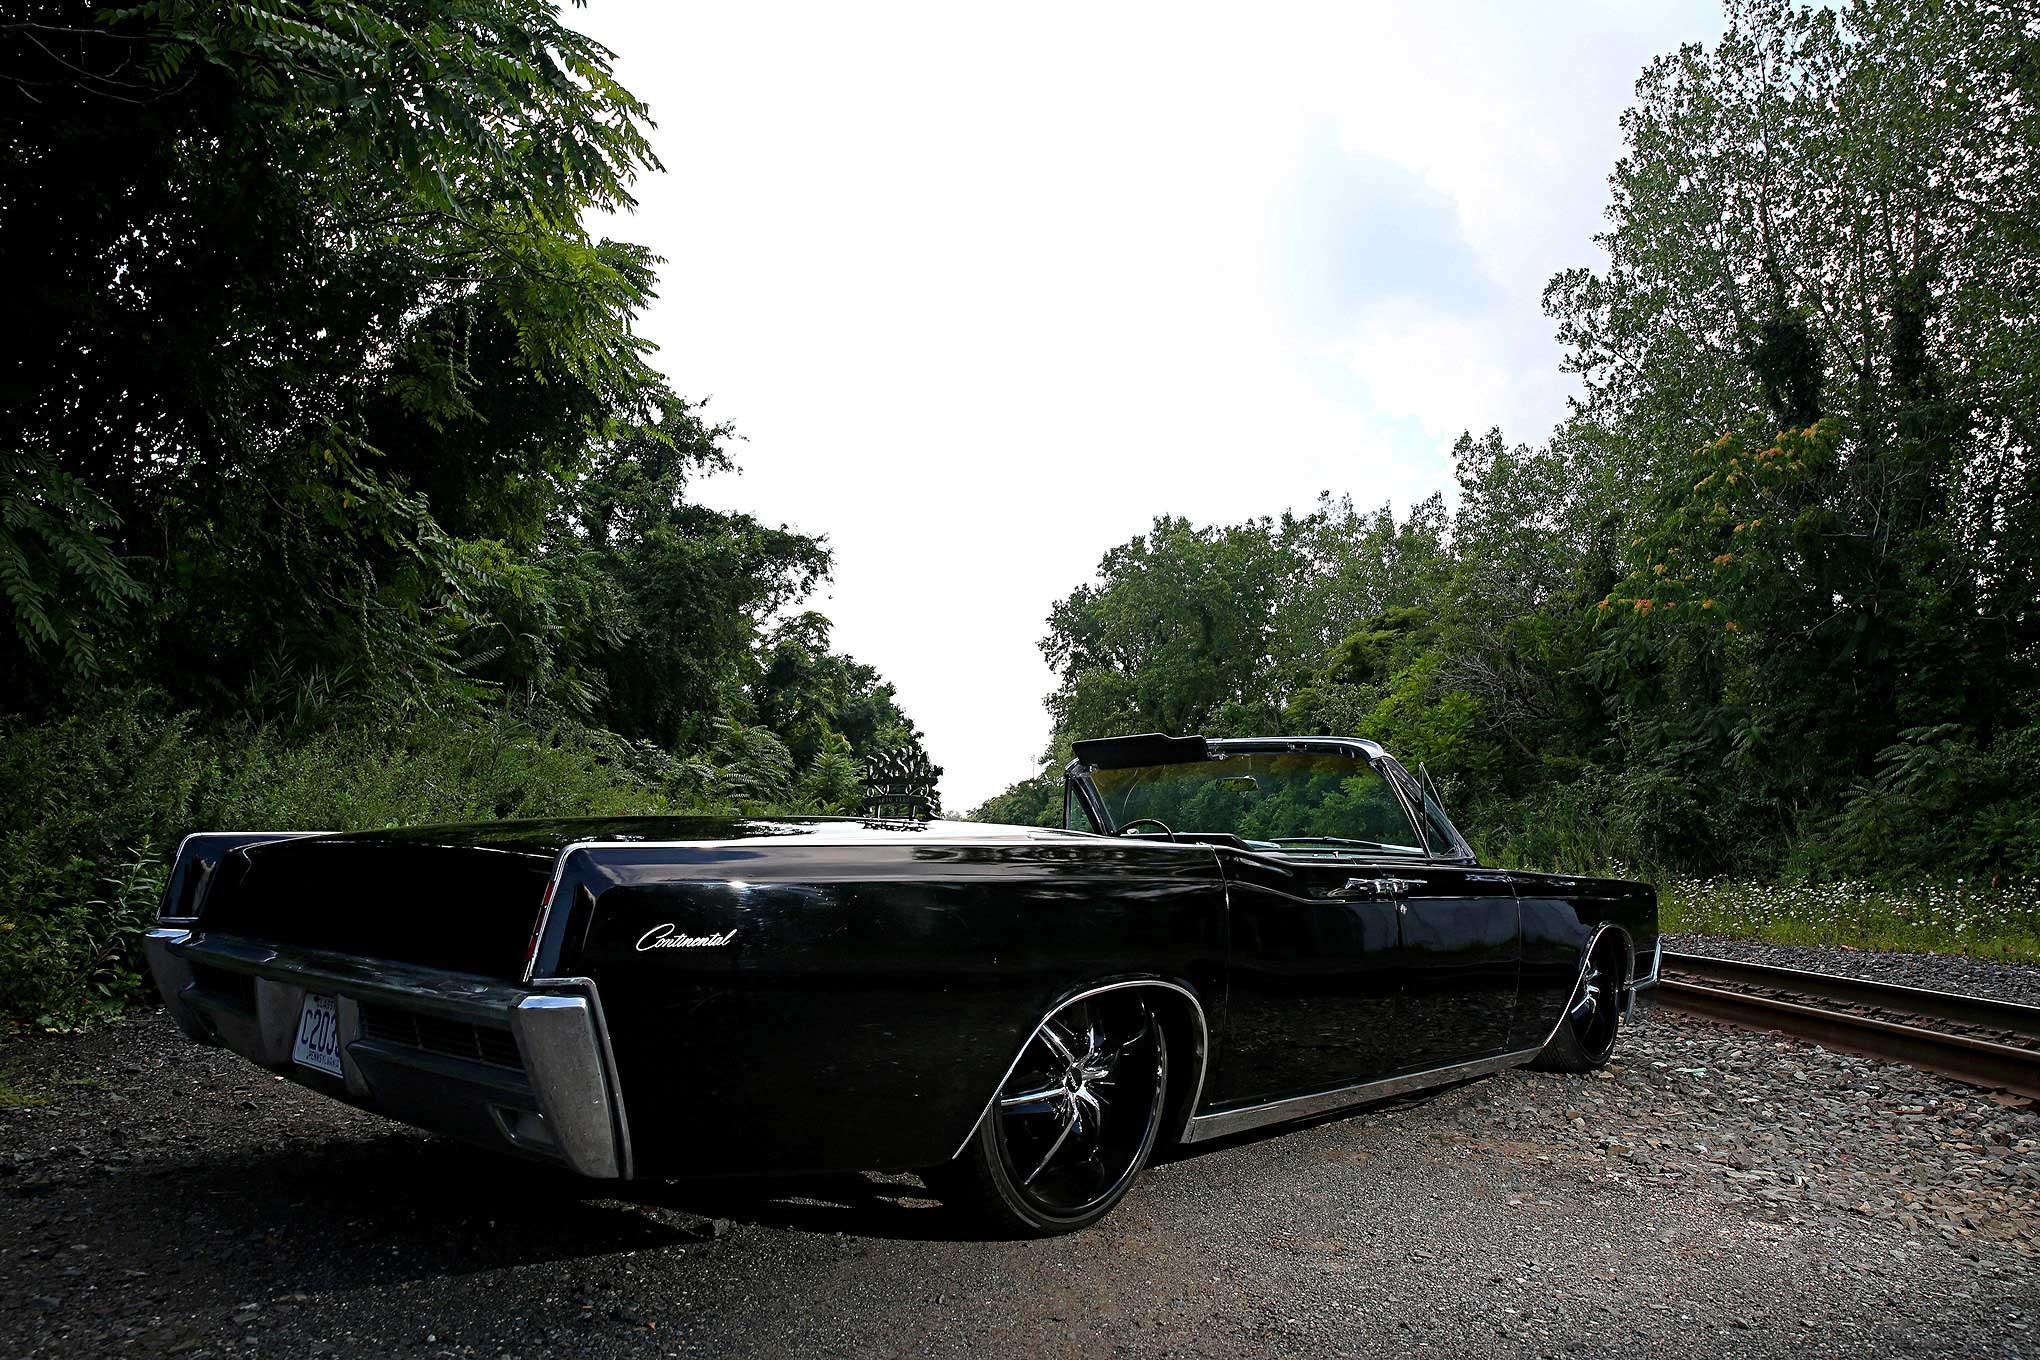 1966 Lincoln Continental - Yin & Yang